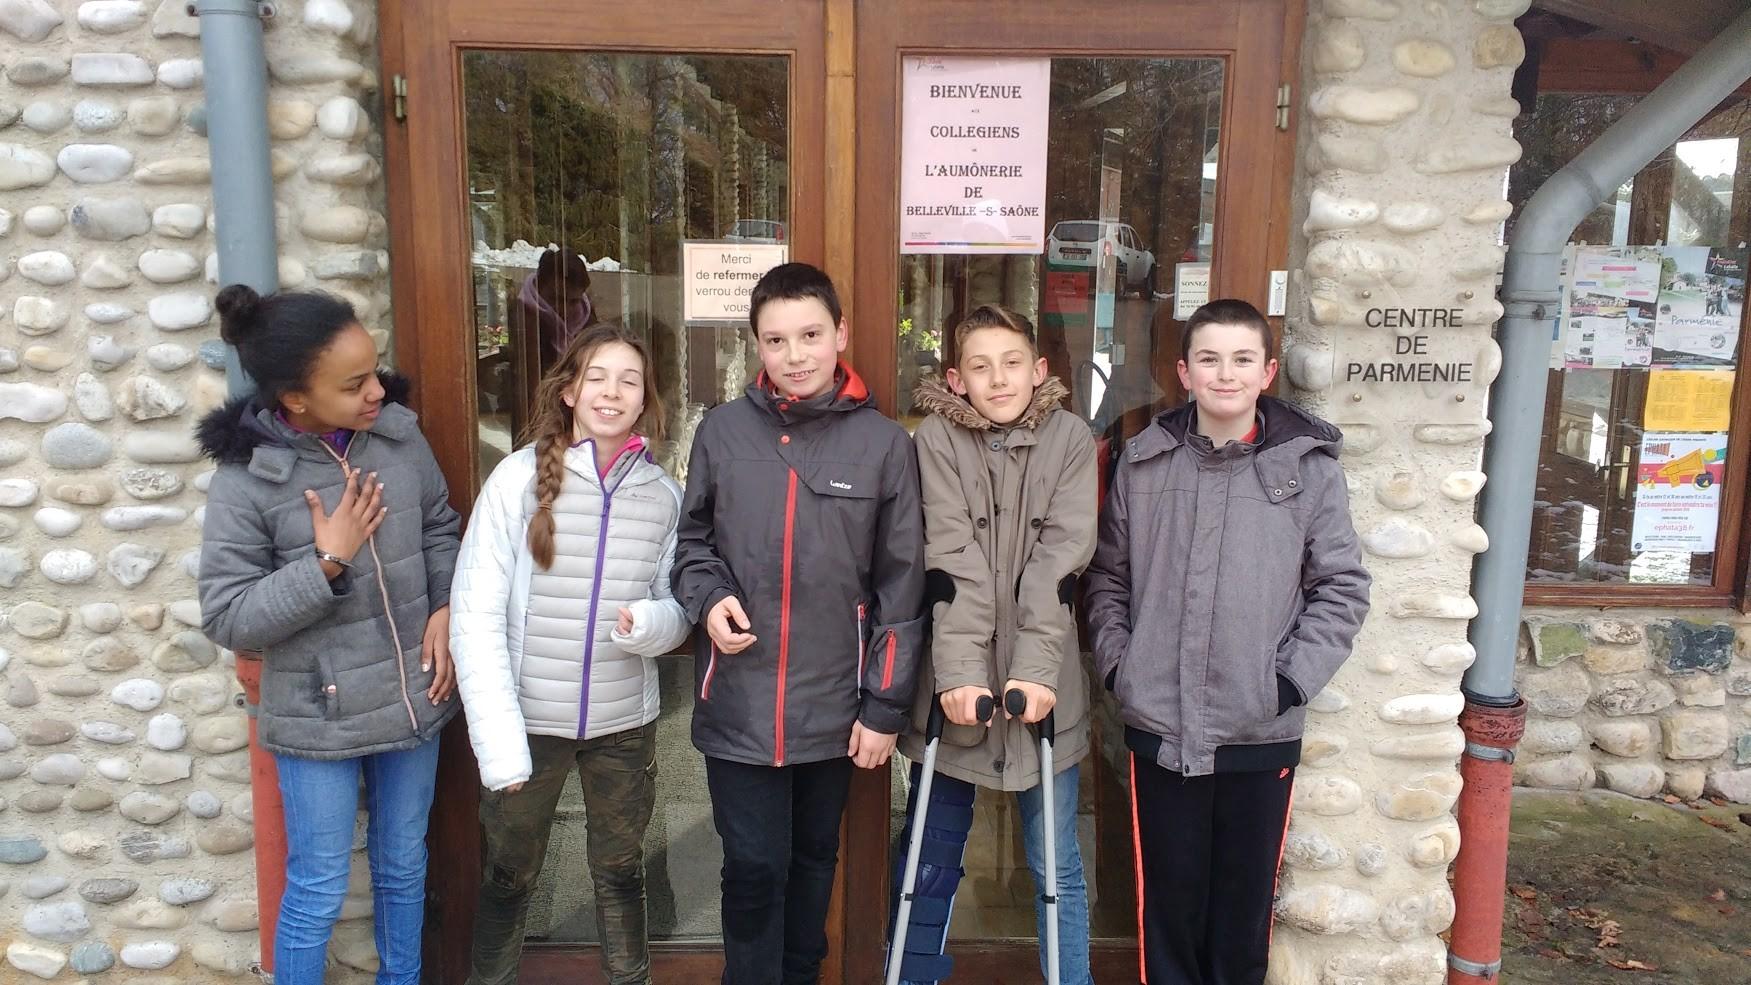 Week end aumônerie du Collège Belleville sur Saône